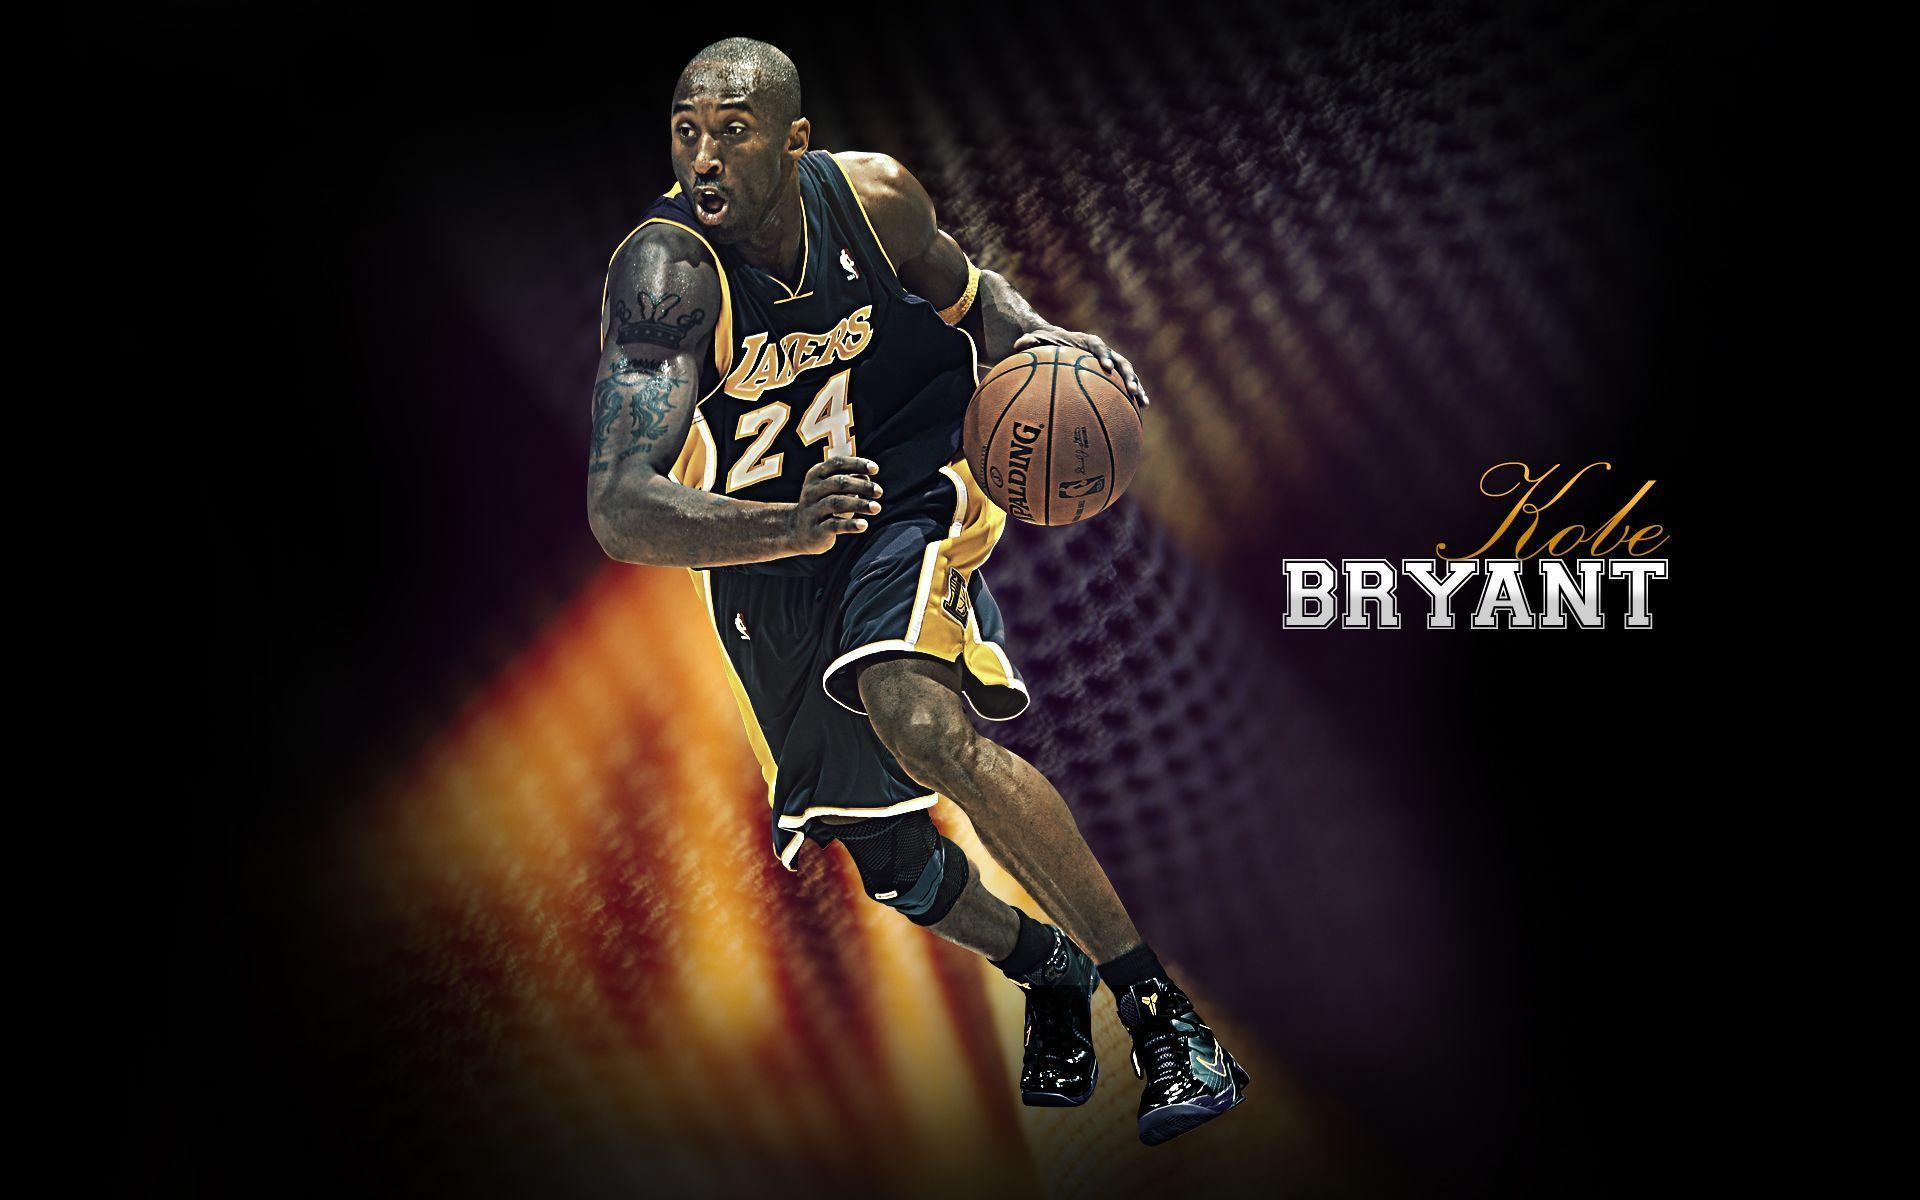 Kobe Bryant Wallpaper Hd 2016